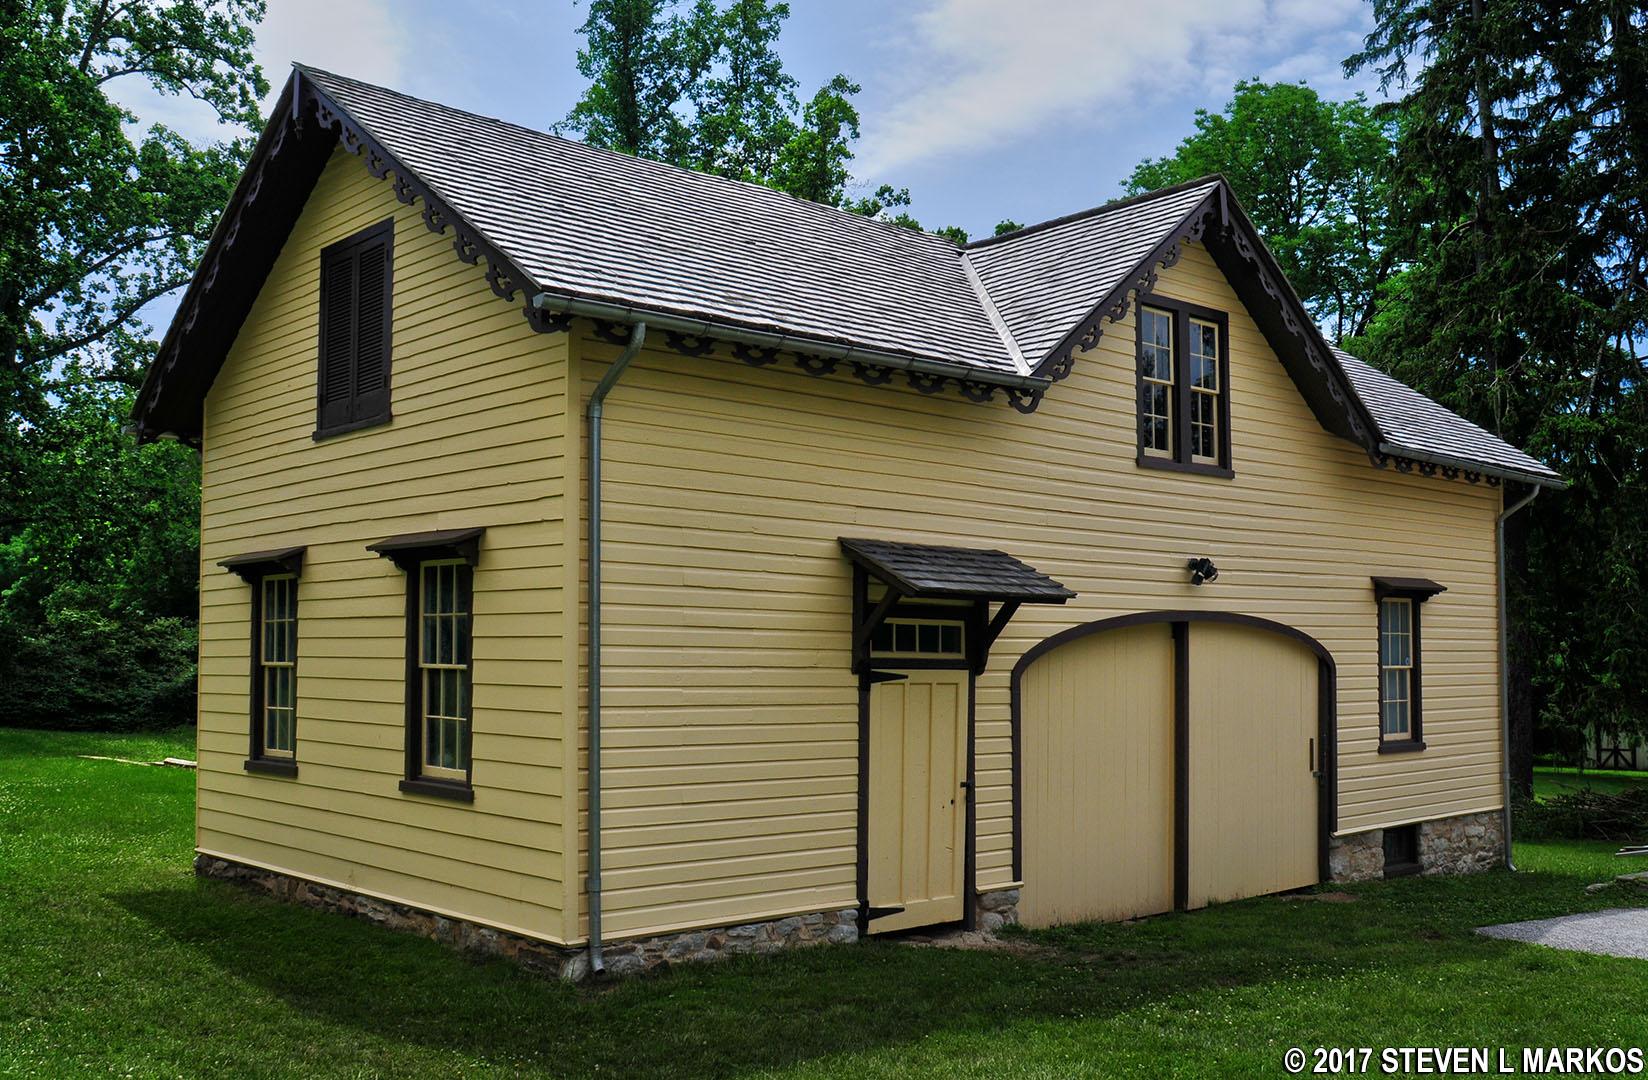 Hampton national historic site - Carriage House At Hampton National Historic Site